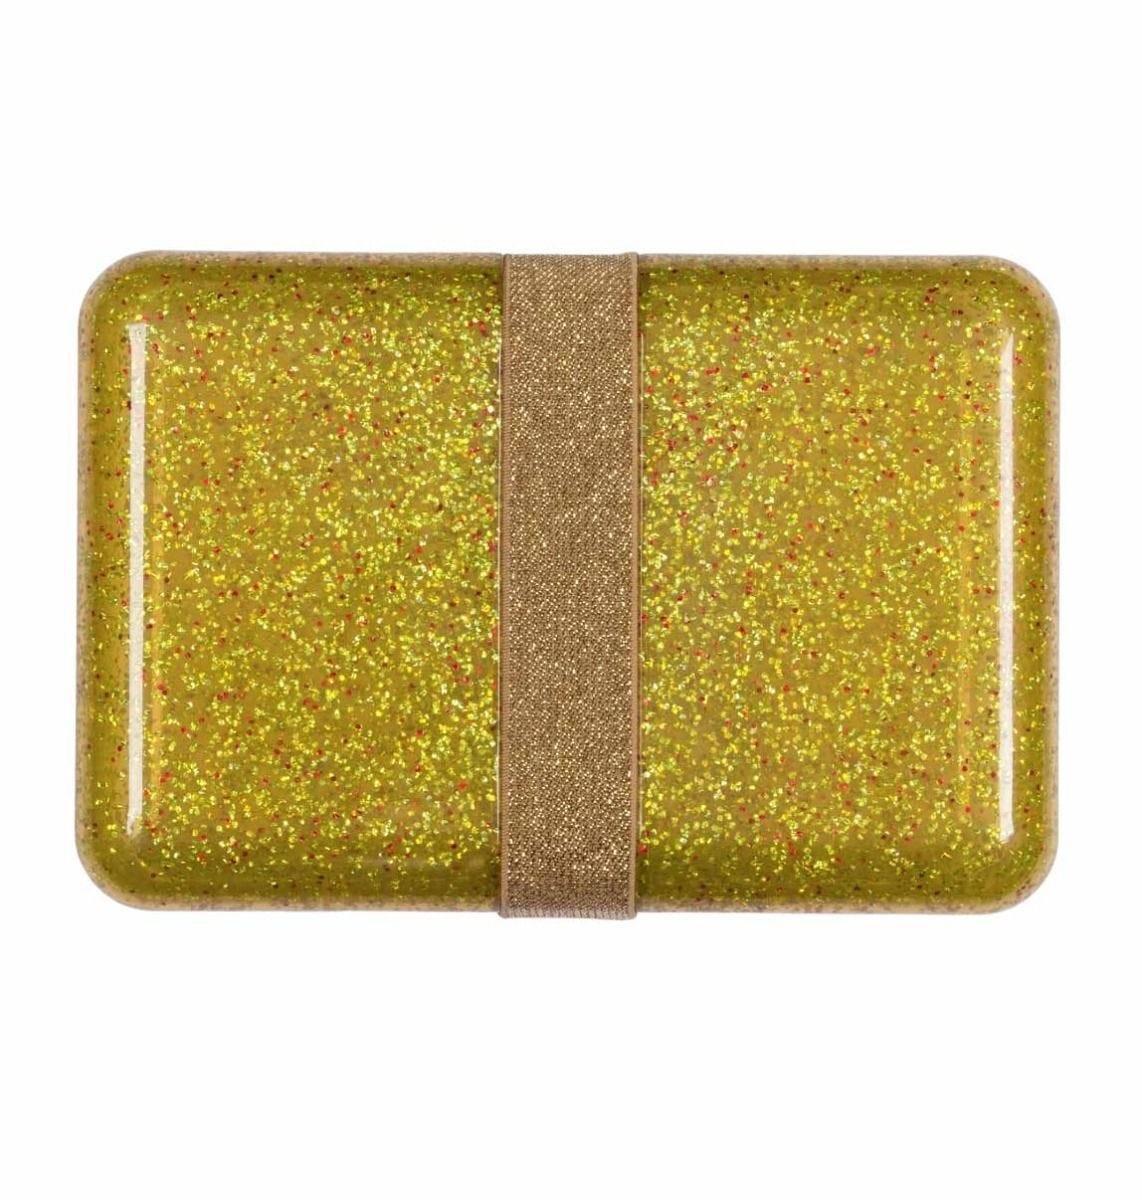 A Little Lovely Company - Lunch box: Glitter - gold